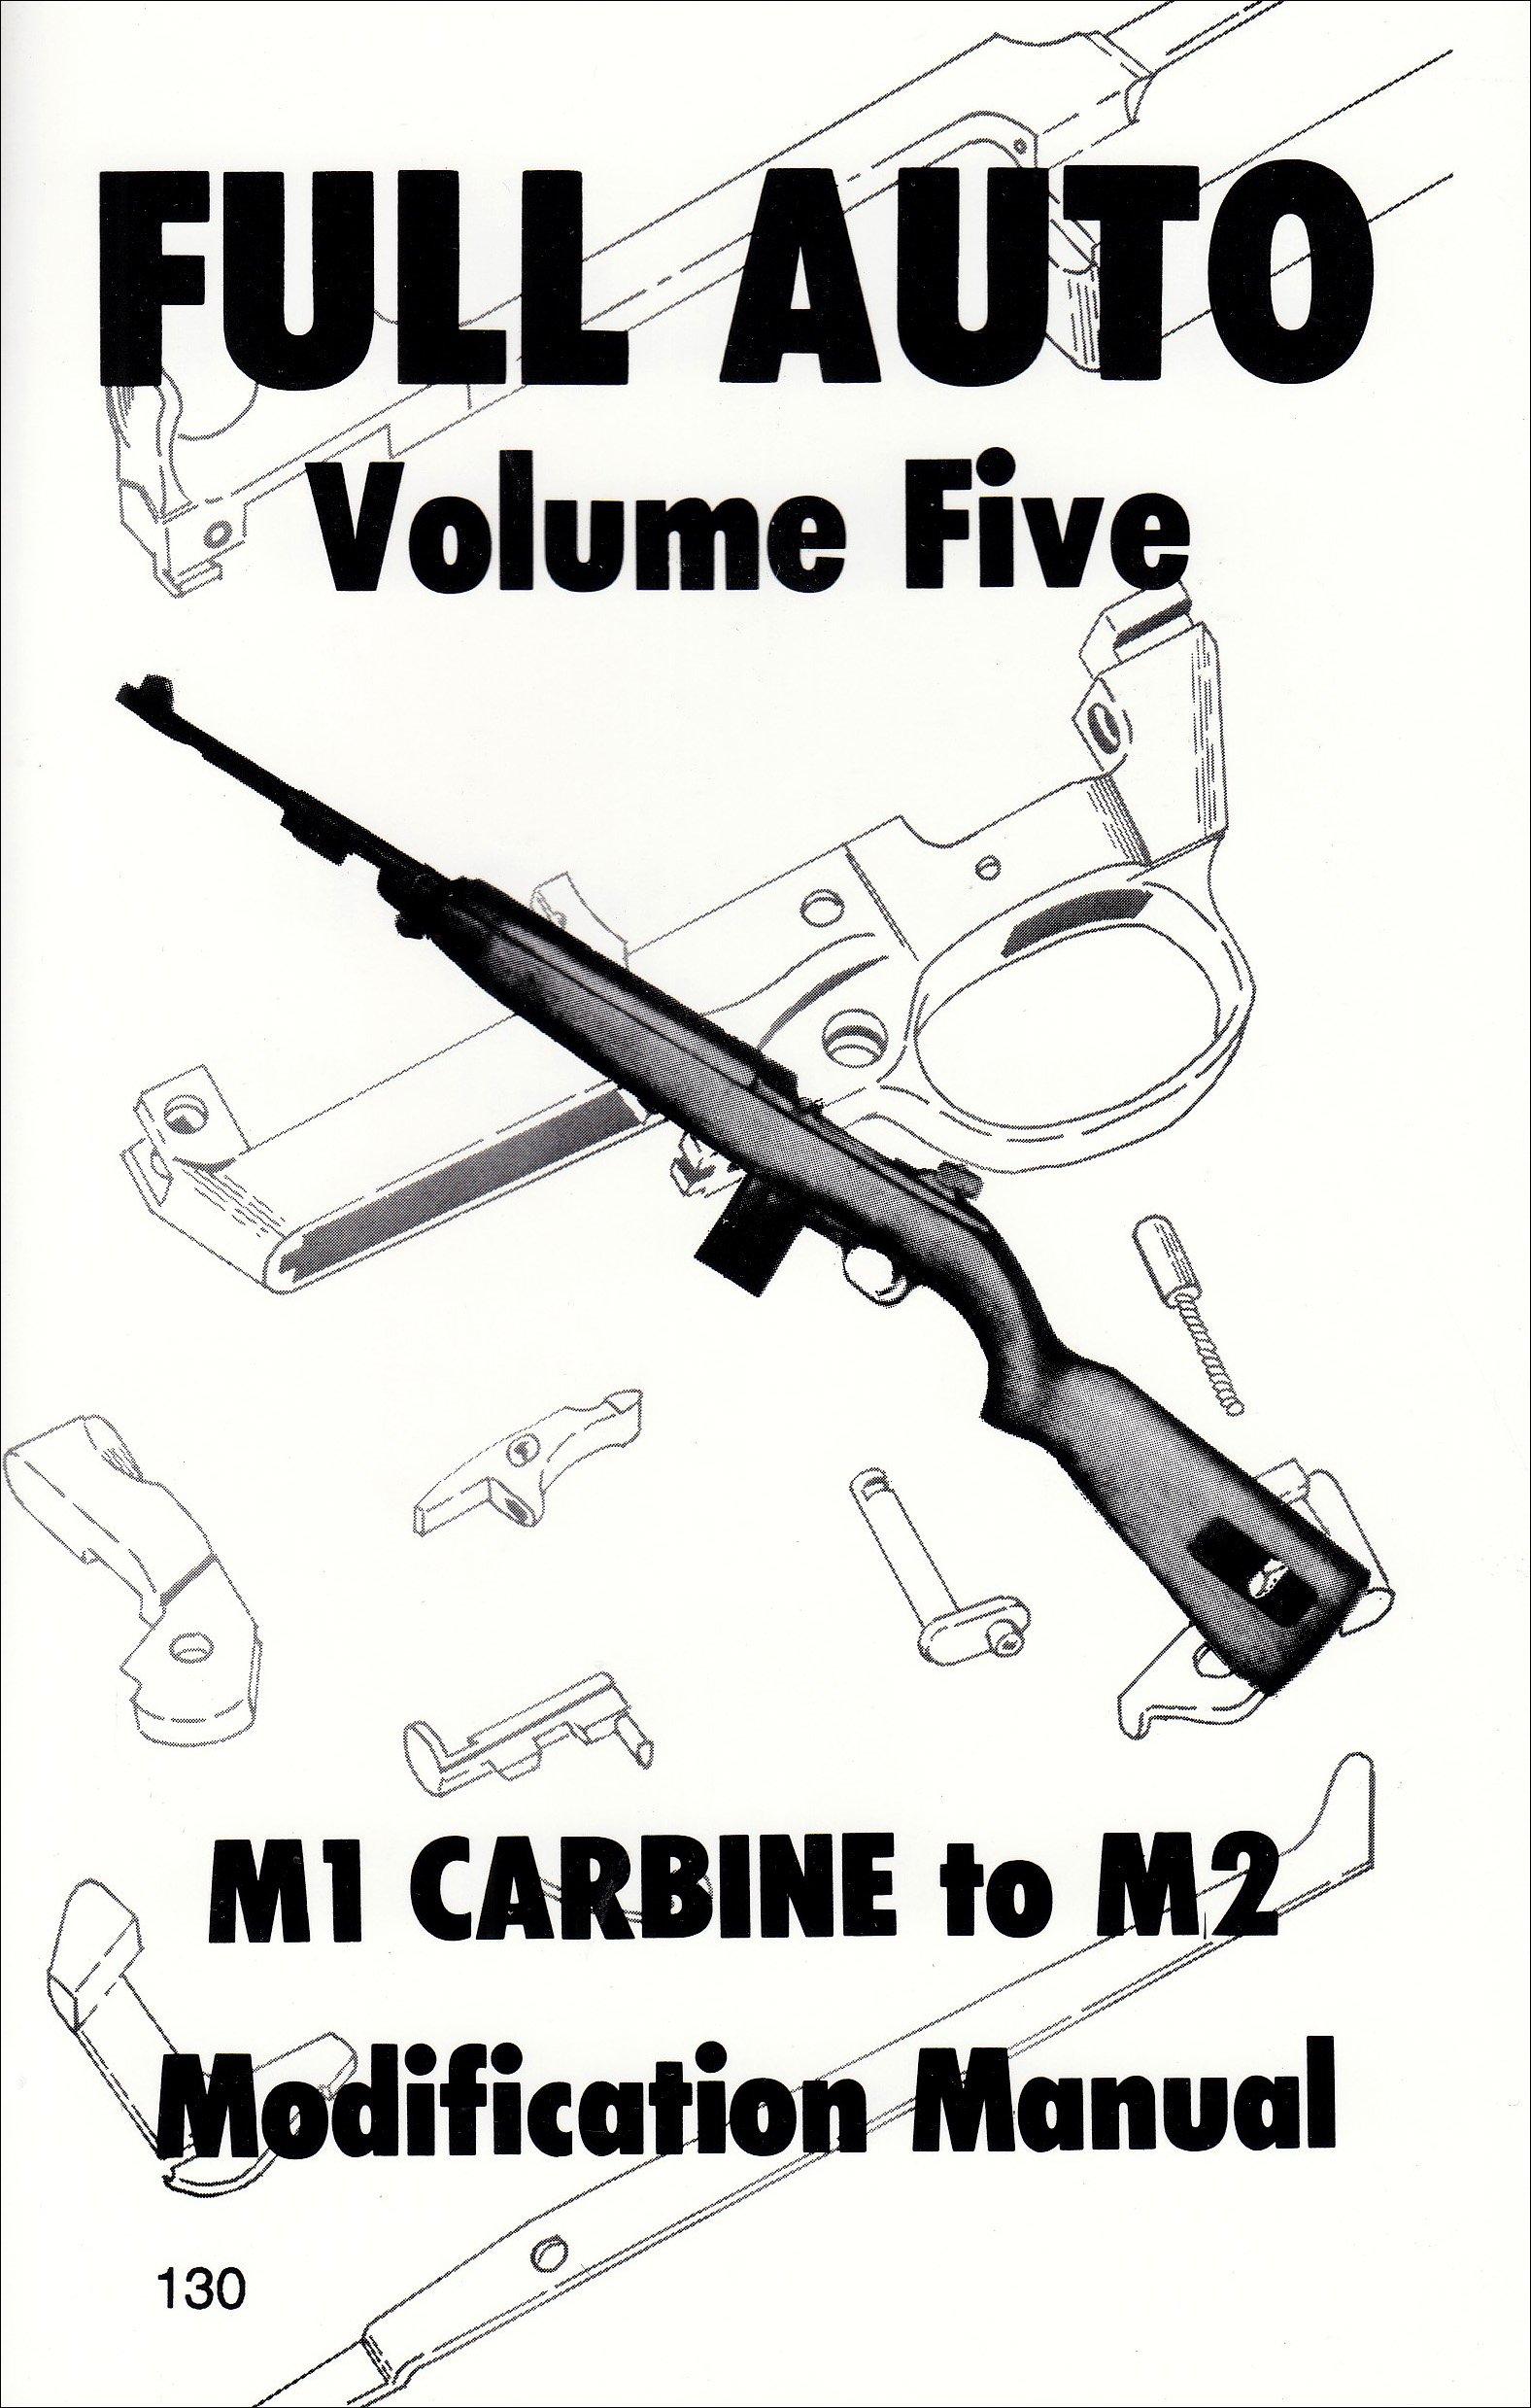 Full auto m1 carbine to m2 modification manual youtube.